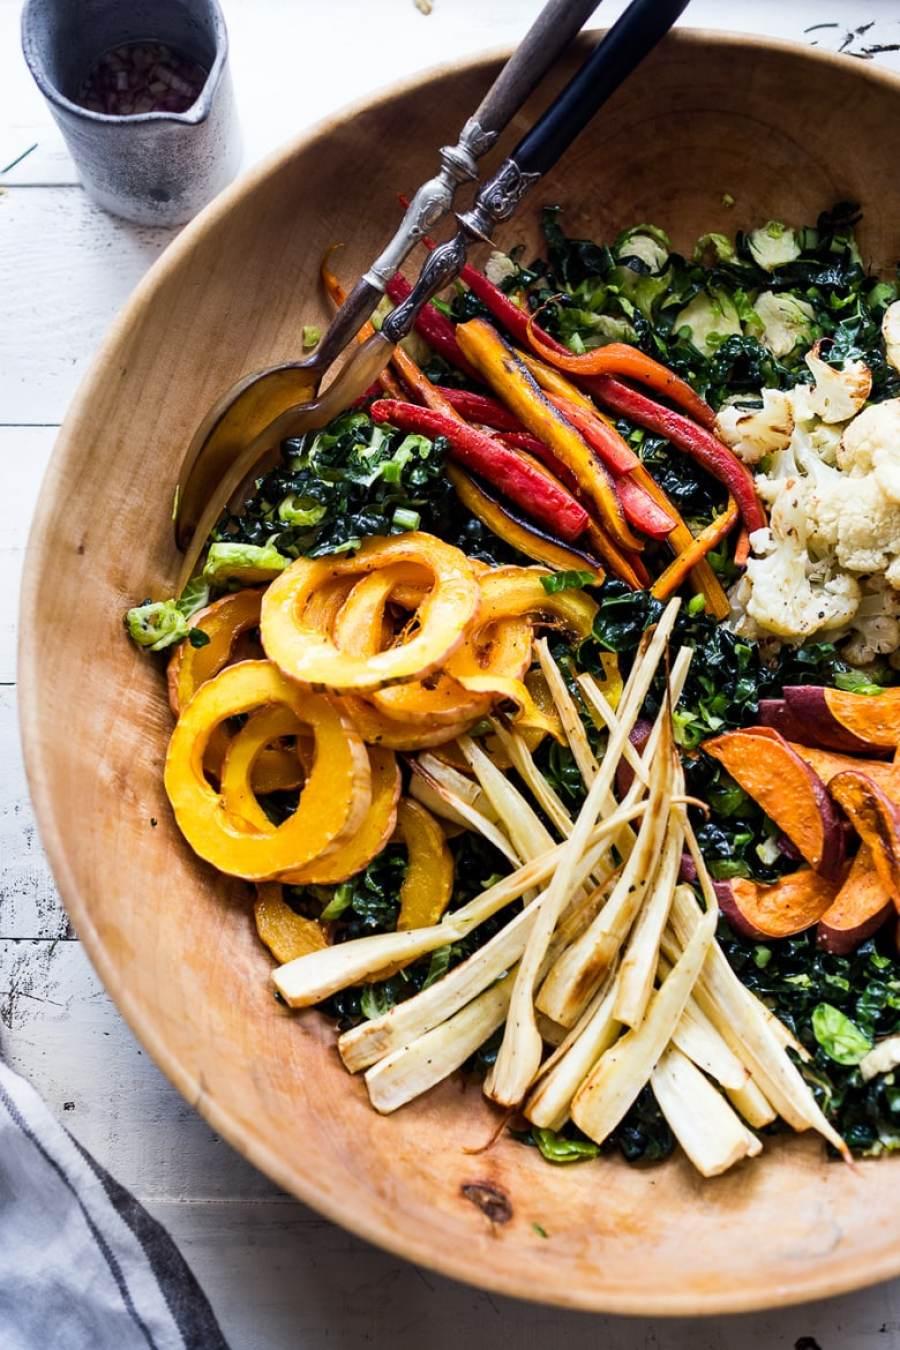 Eat clean 20 simple veggie based meals feasting at home eat clean w these 20 simple plant based meals like this roasted veggie forumfinder Choice Image